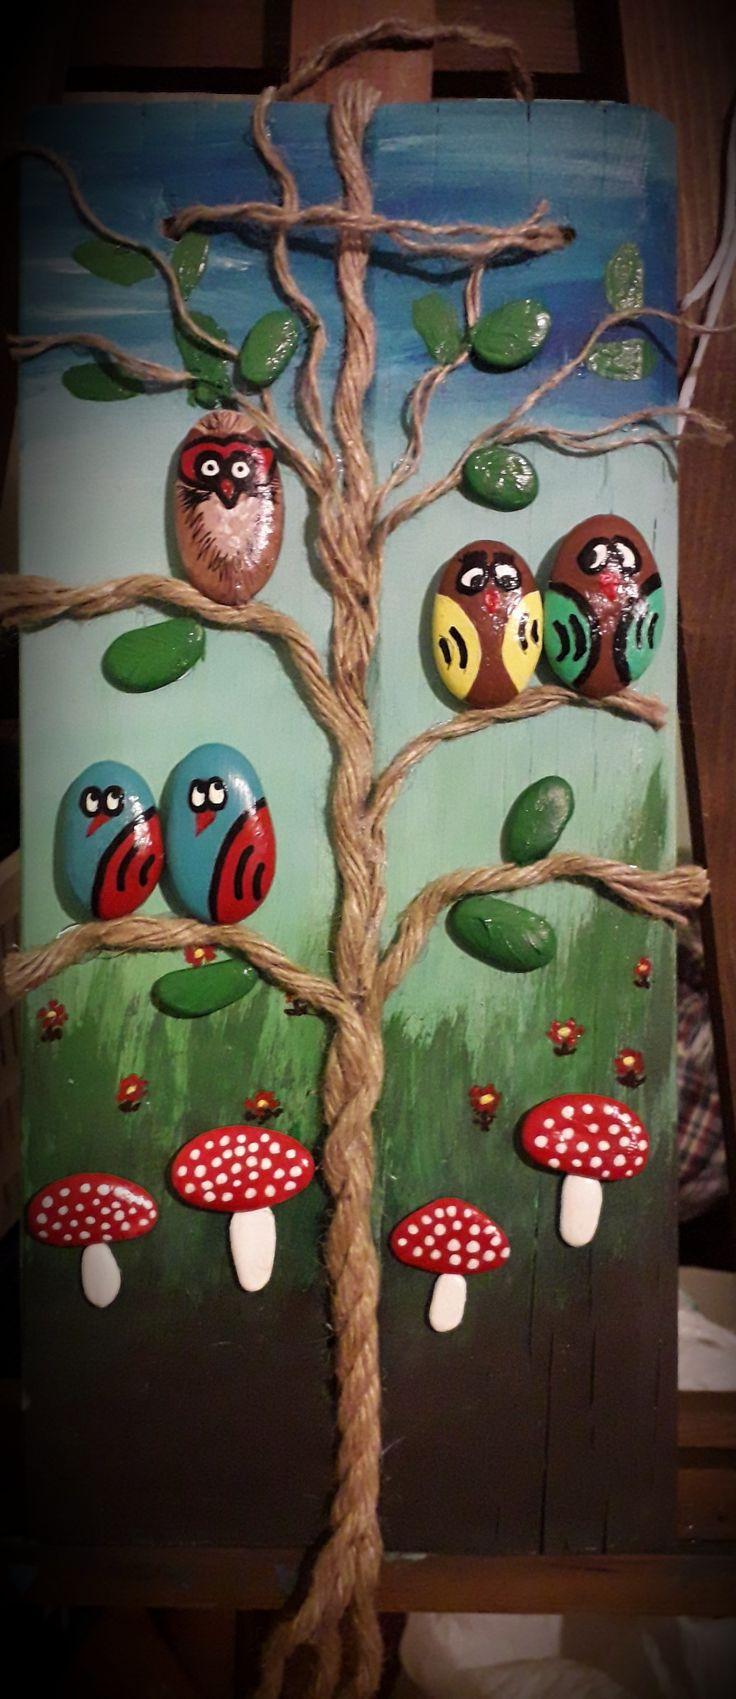 Diy Pebble Art 39 - 55+ Of The Best Creative DIY Ideas For Pebble Art Crafts